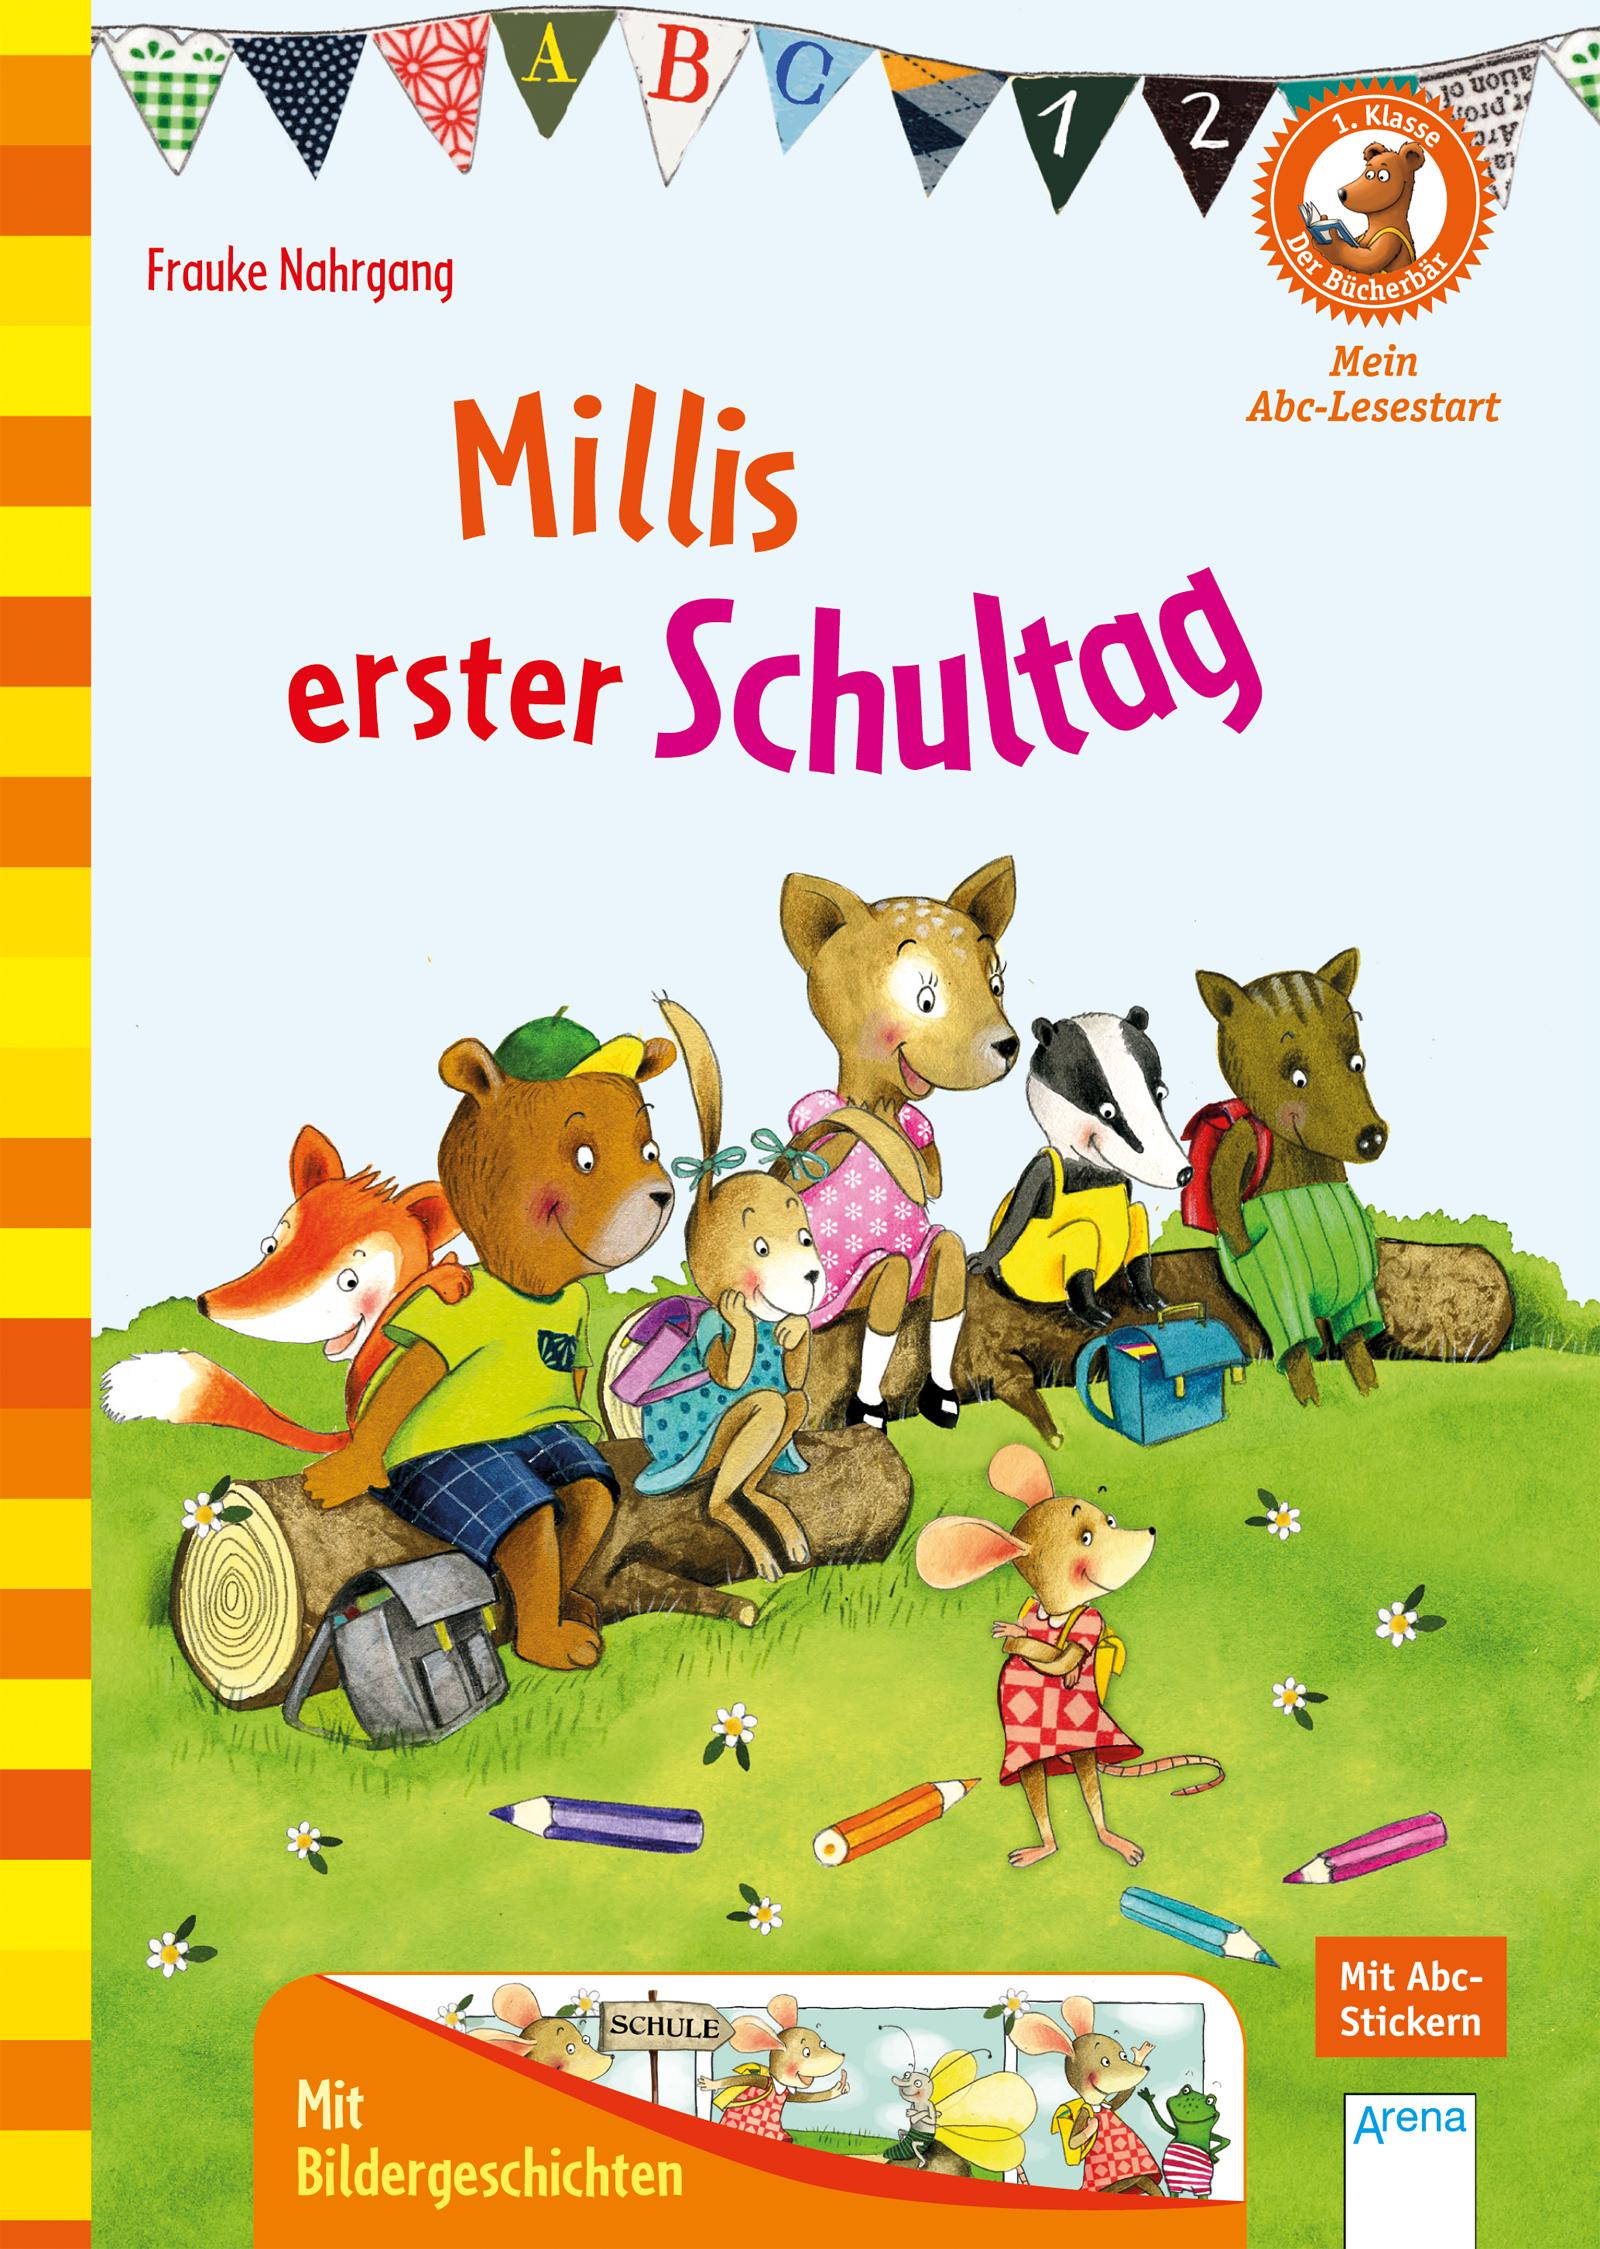 Millis erster Schultag | ARENA Verlag